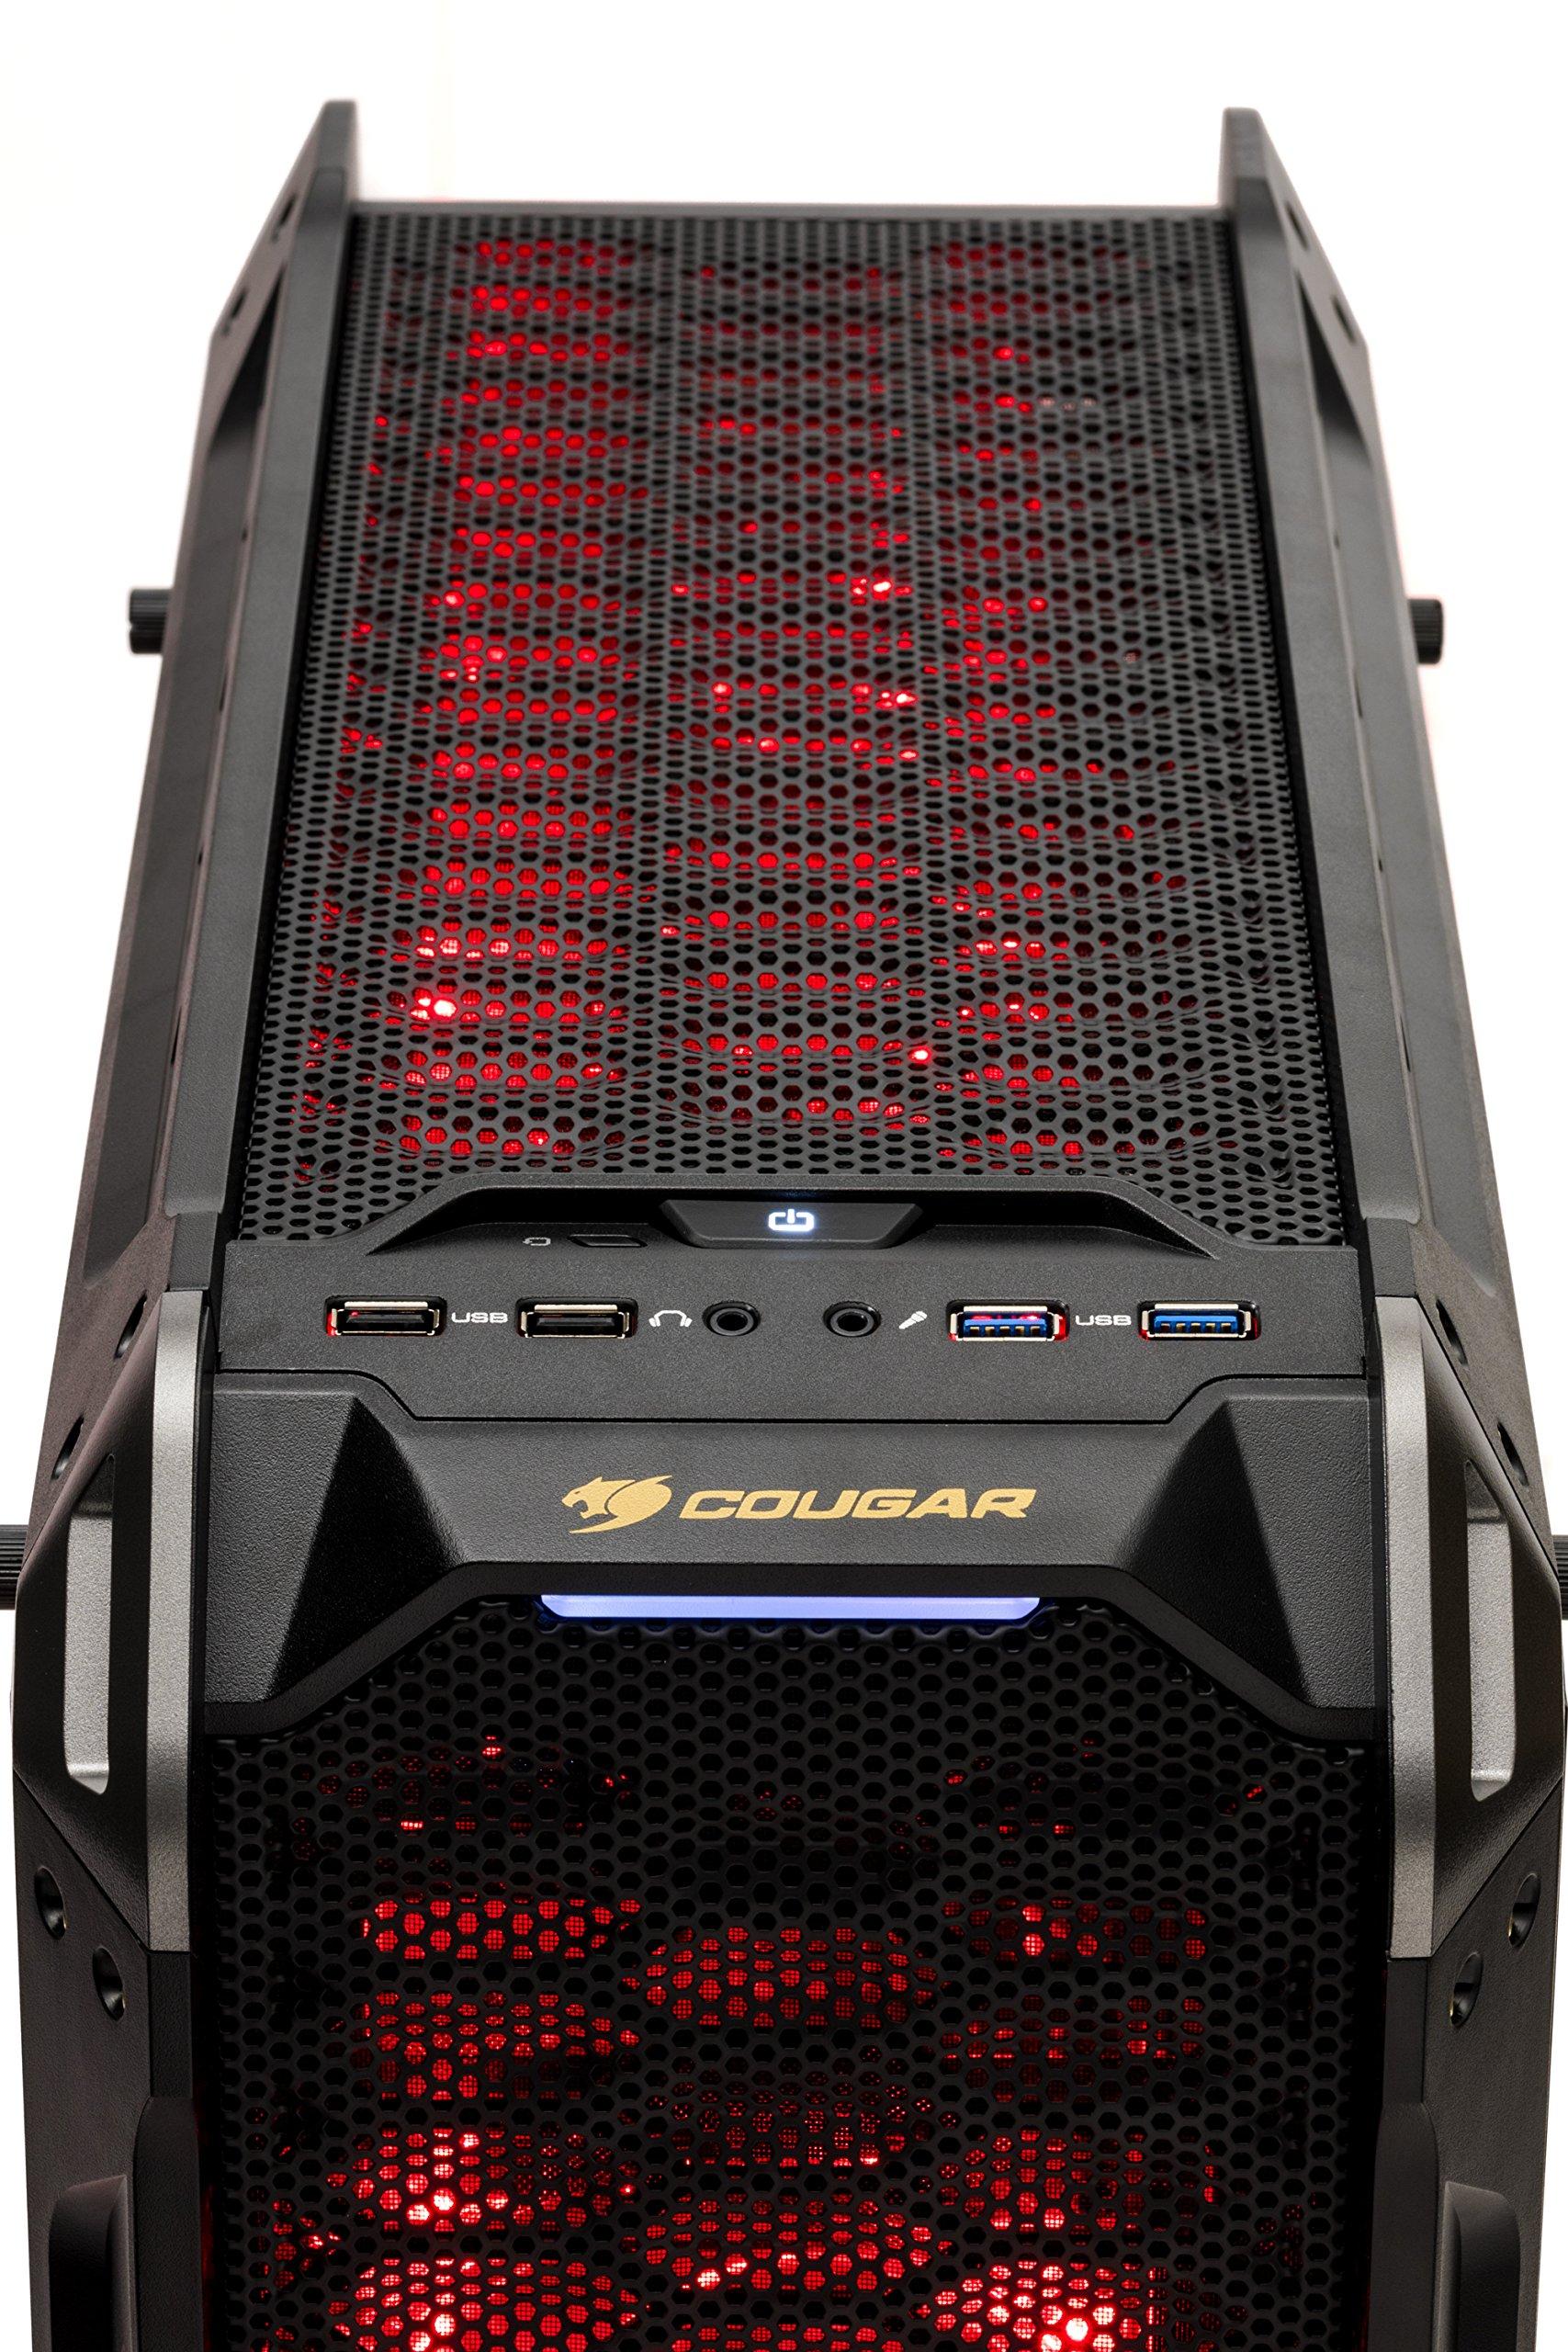 SkyTech Siege - Gaming Computer PC Desktop - RYZEN 7 1700X, Samsung 850 EVO 250GB SSD, GTX 1080 8GB, 120mm Liquid Cool, 2TB HDD, 16GB DDR4, Windows 10 Home (Ryzen 7 1700X | GTX 1080) by Skytech Gaming (Image #5)